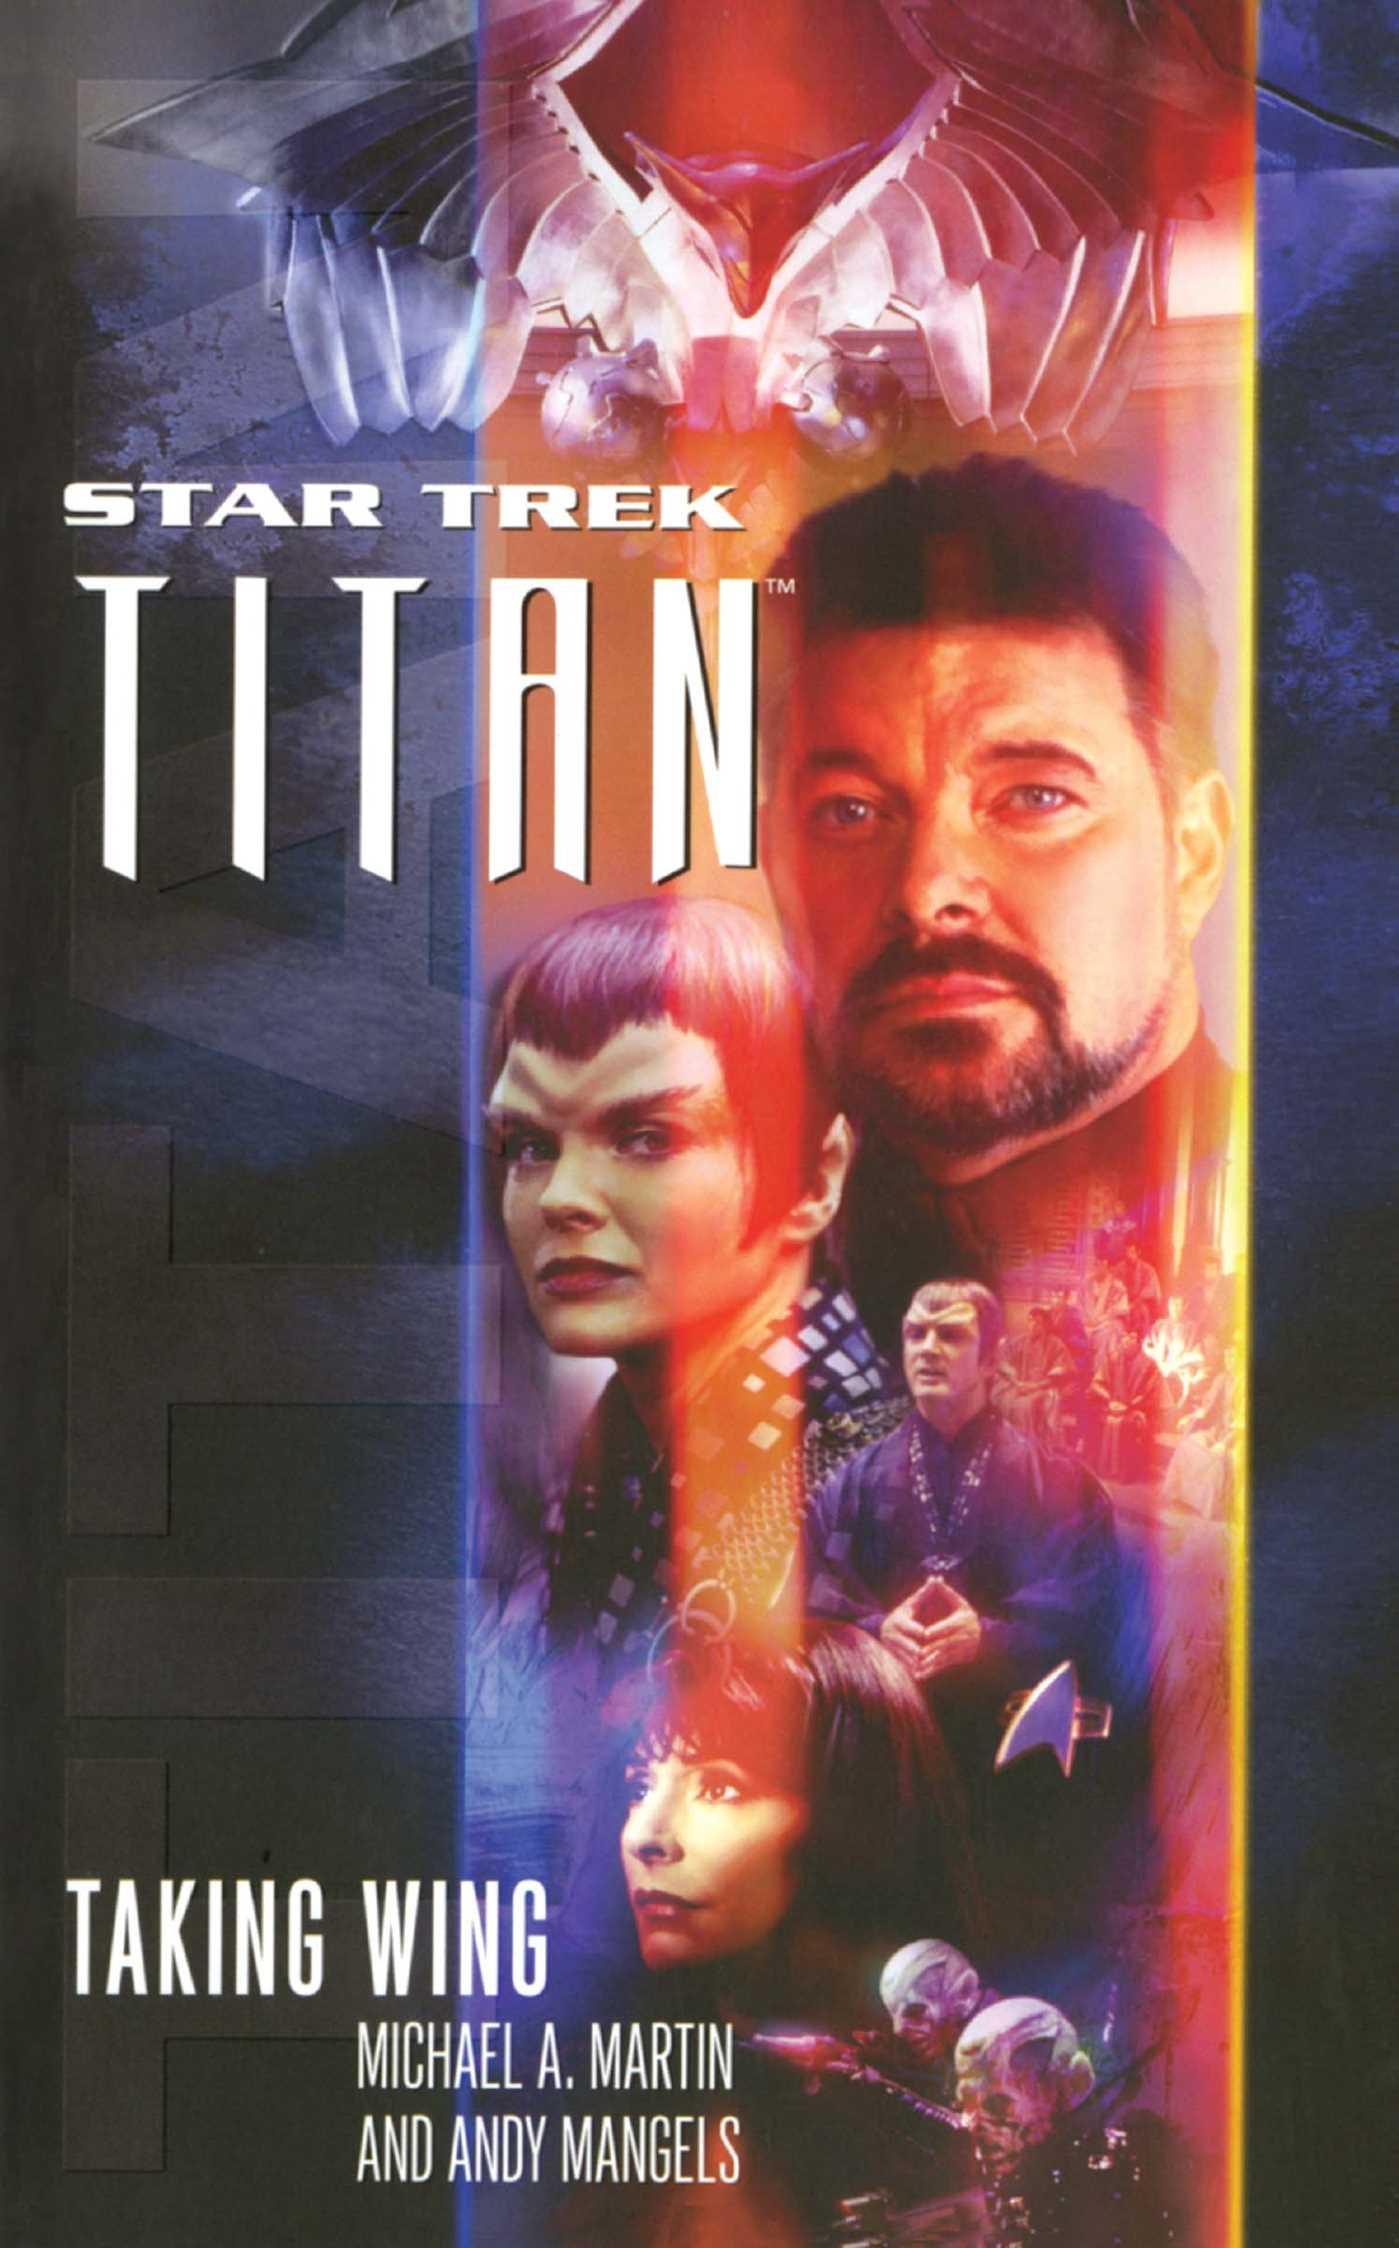 Star trek titan 1 taking wing 9781416506775 hr